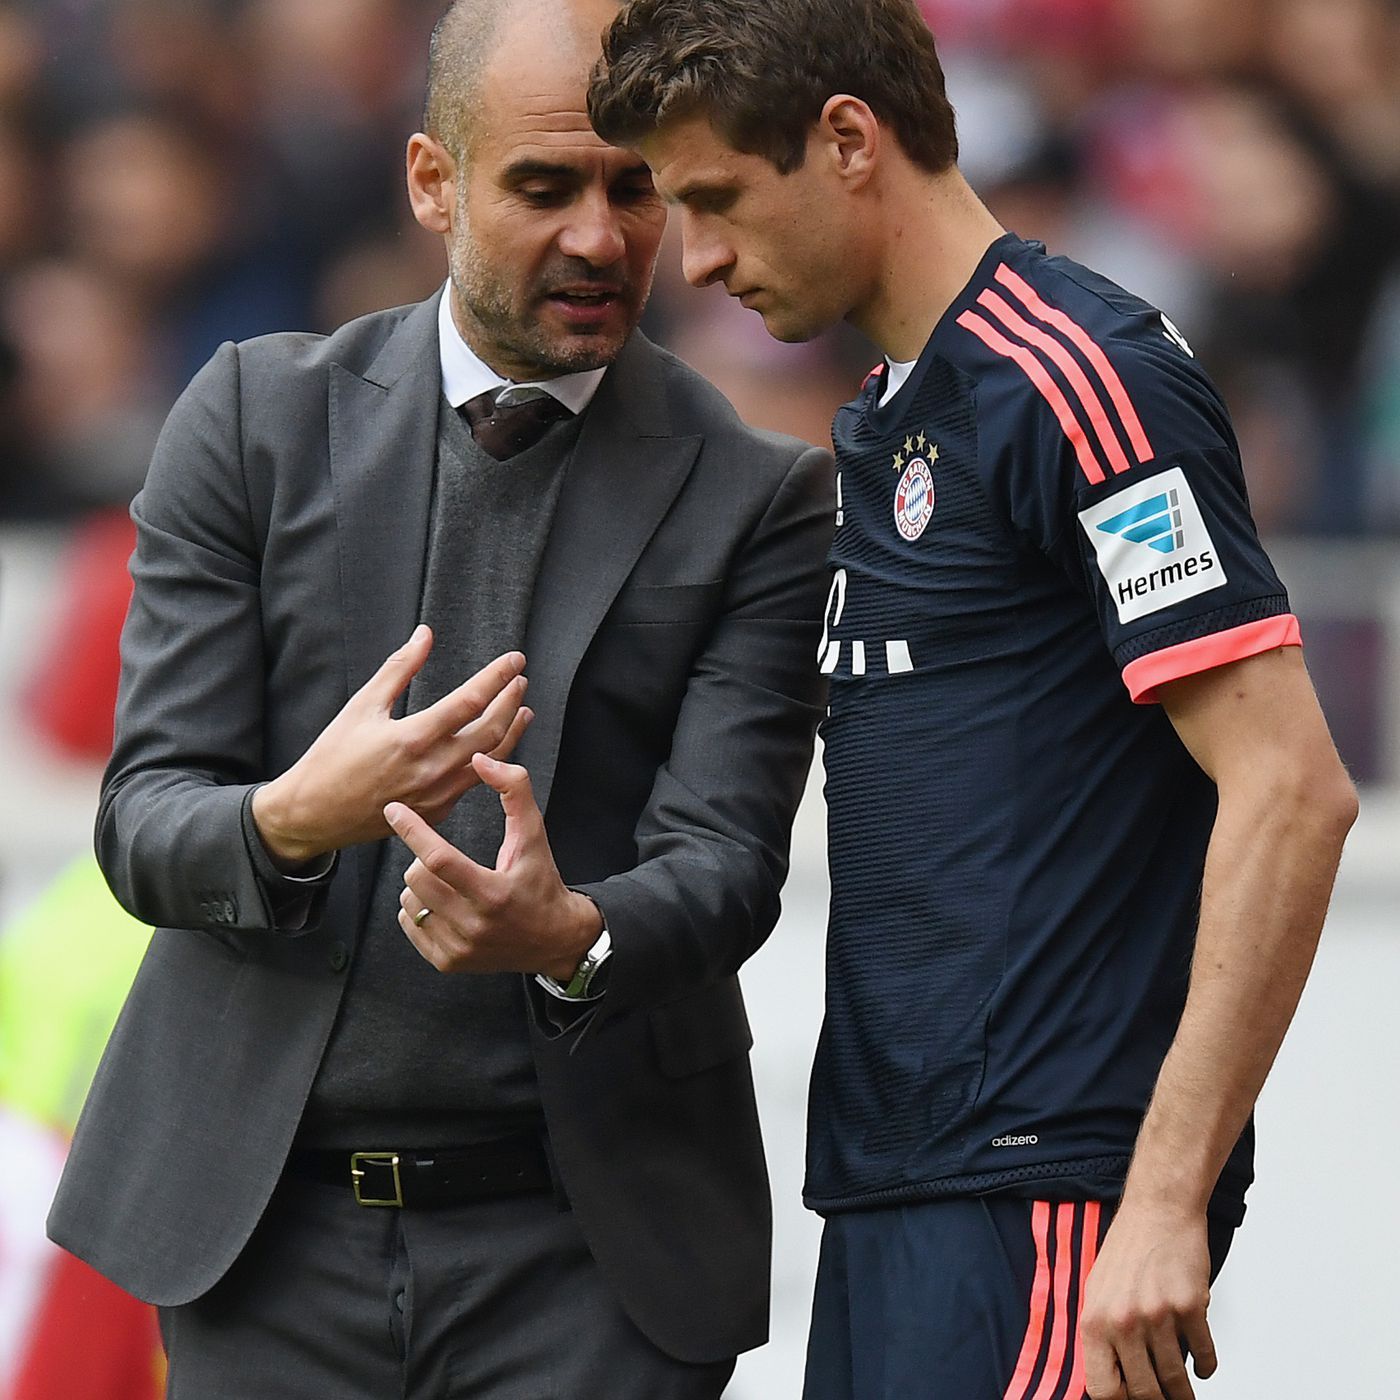 Bayern Munich's Thomas Müller reminisces about Pep Guardiola